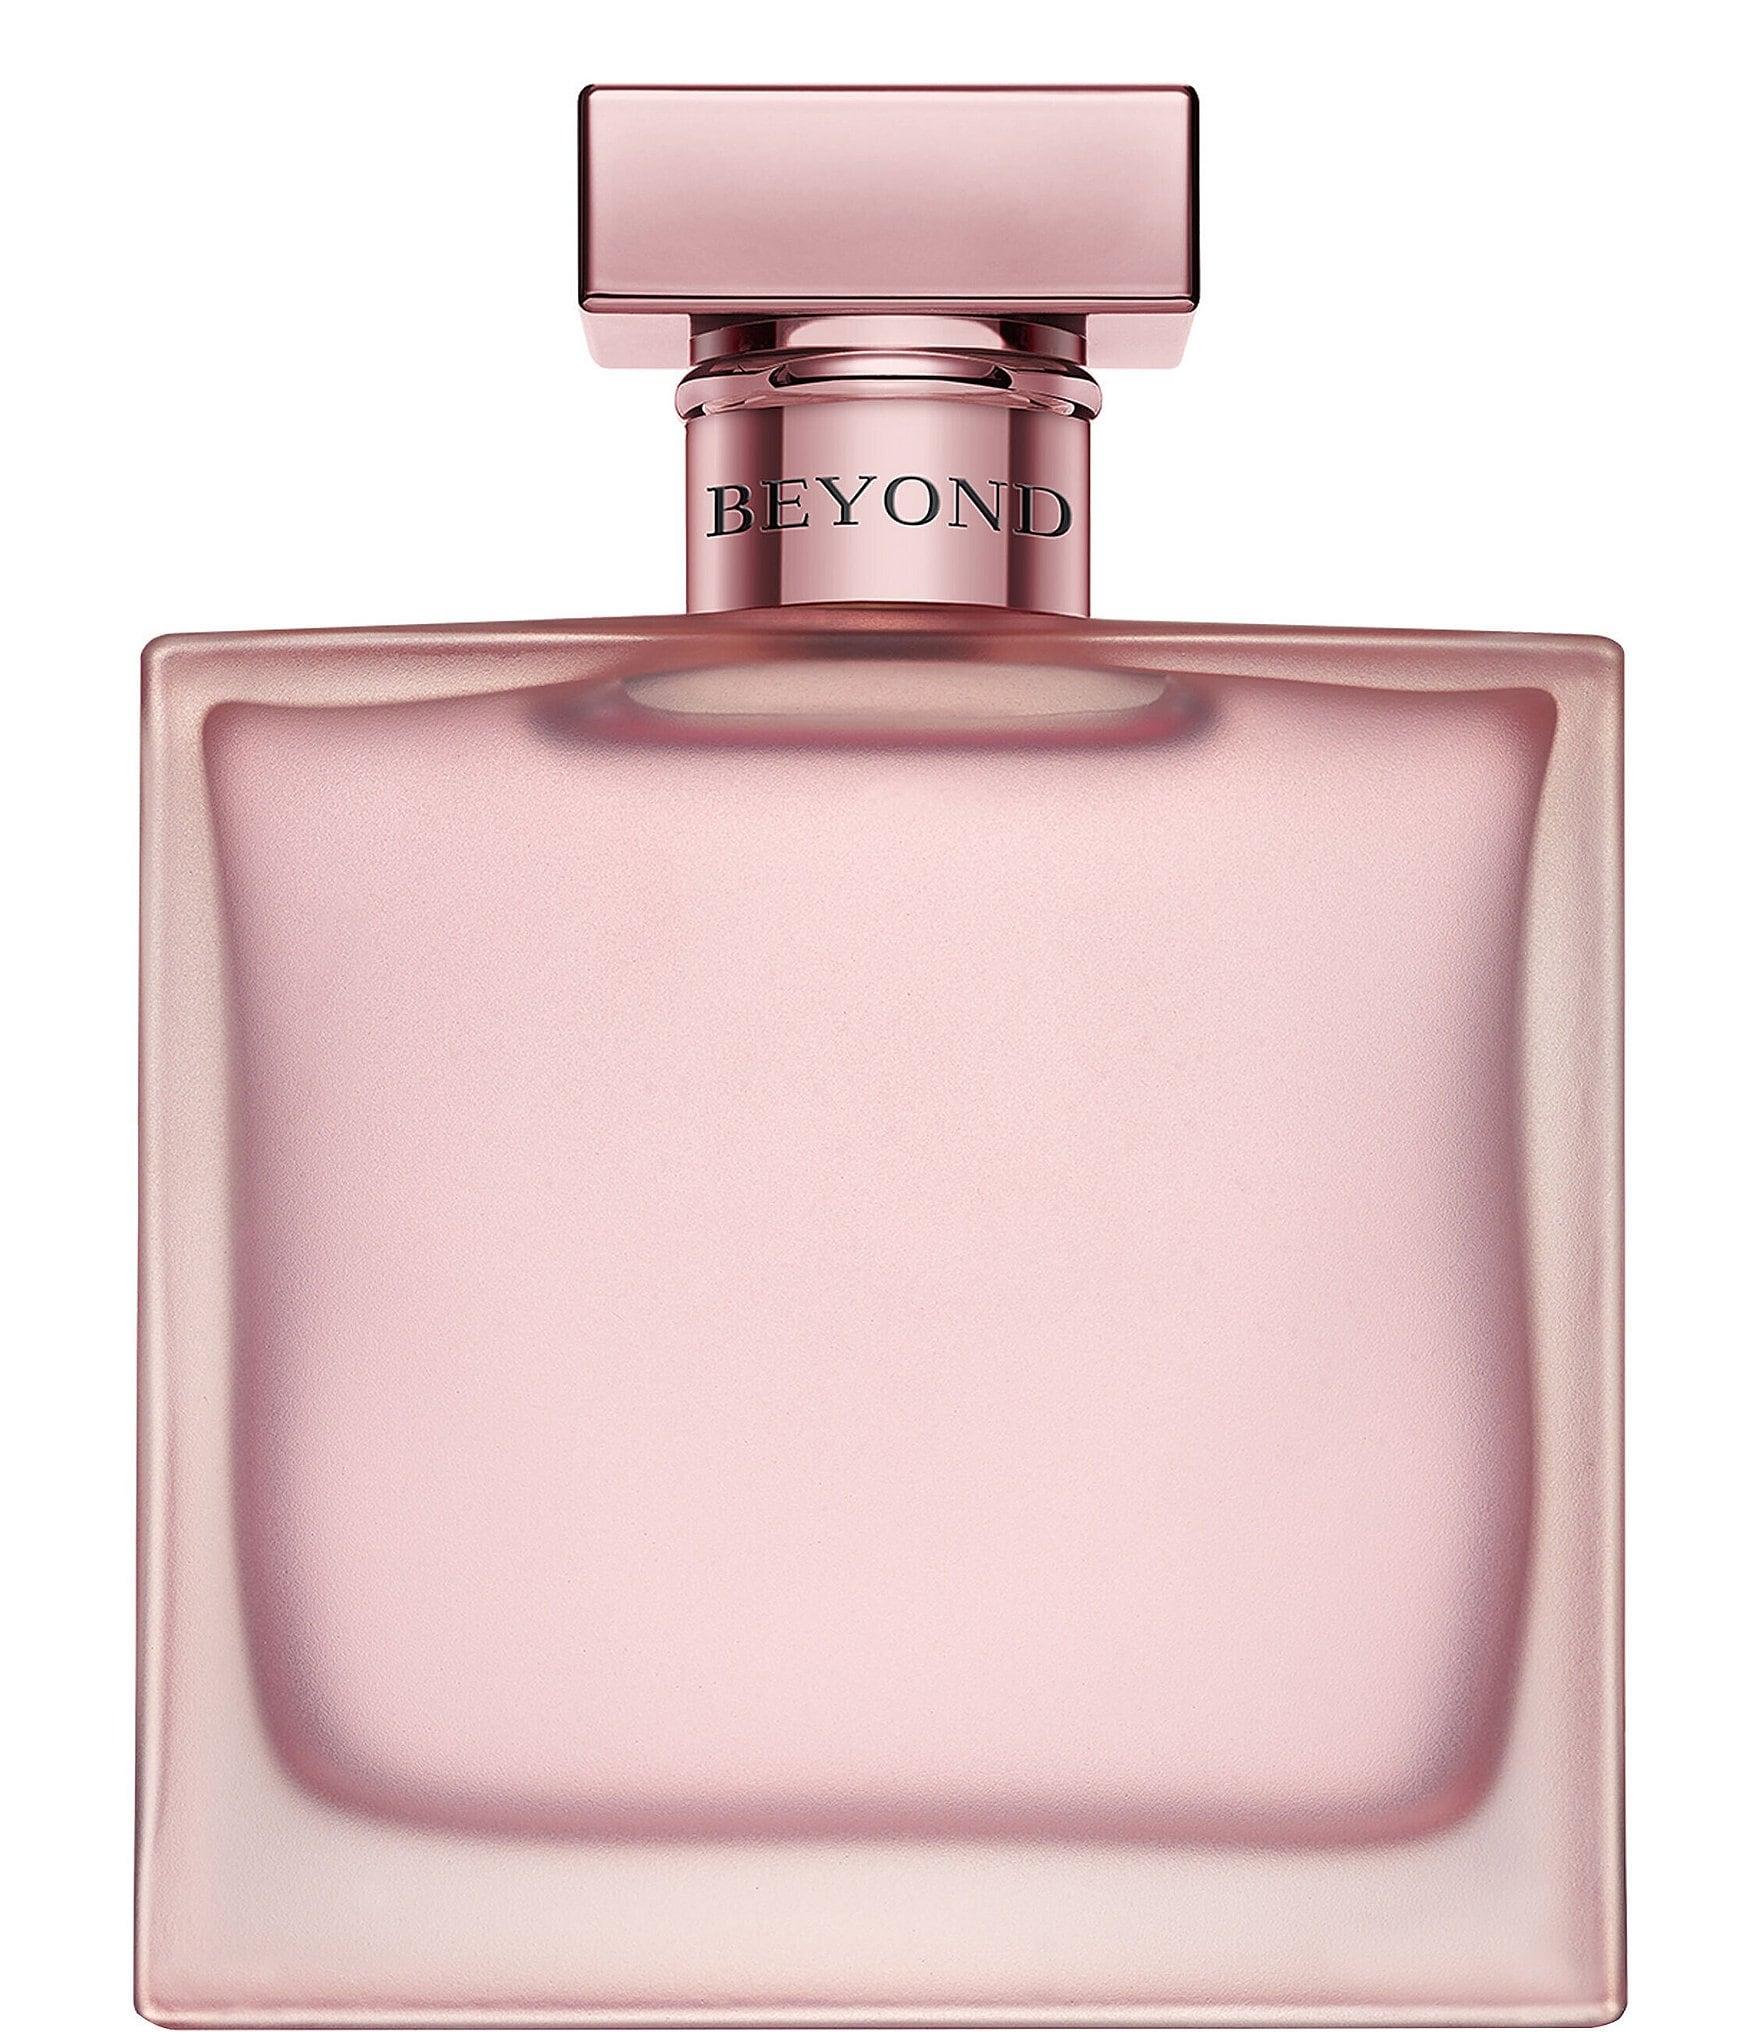 Beyond Romance Eau De Parfum by Ralph Lauren